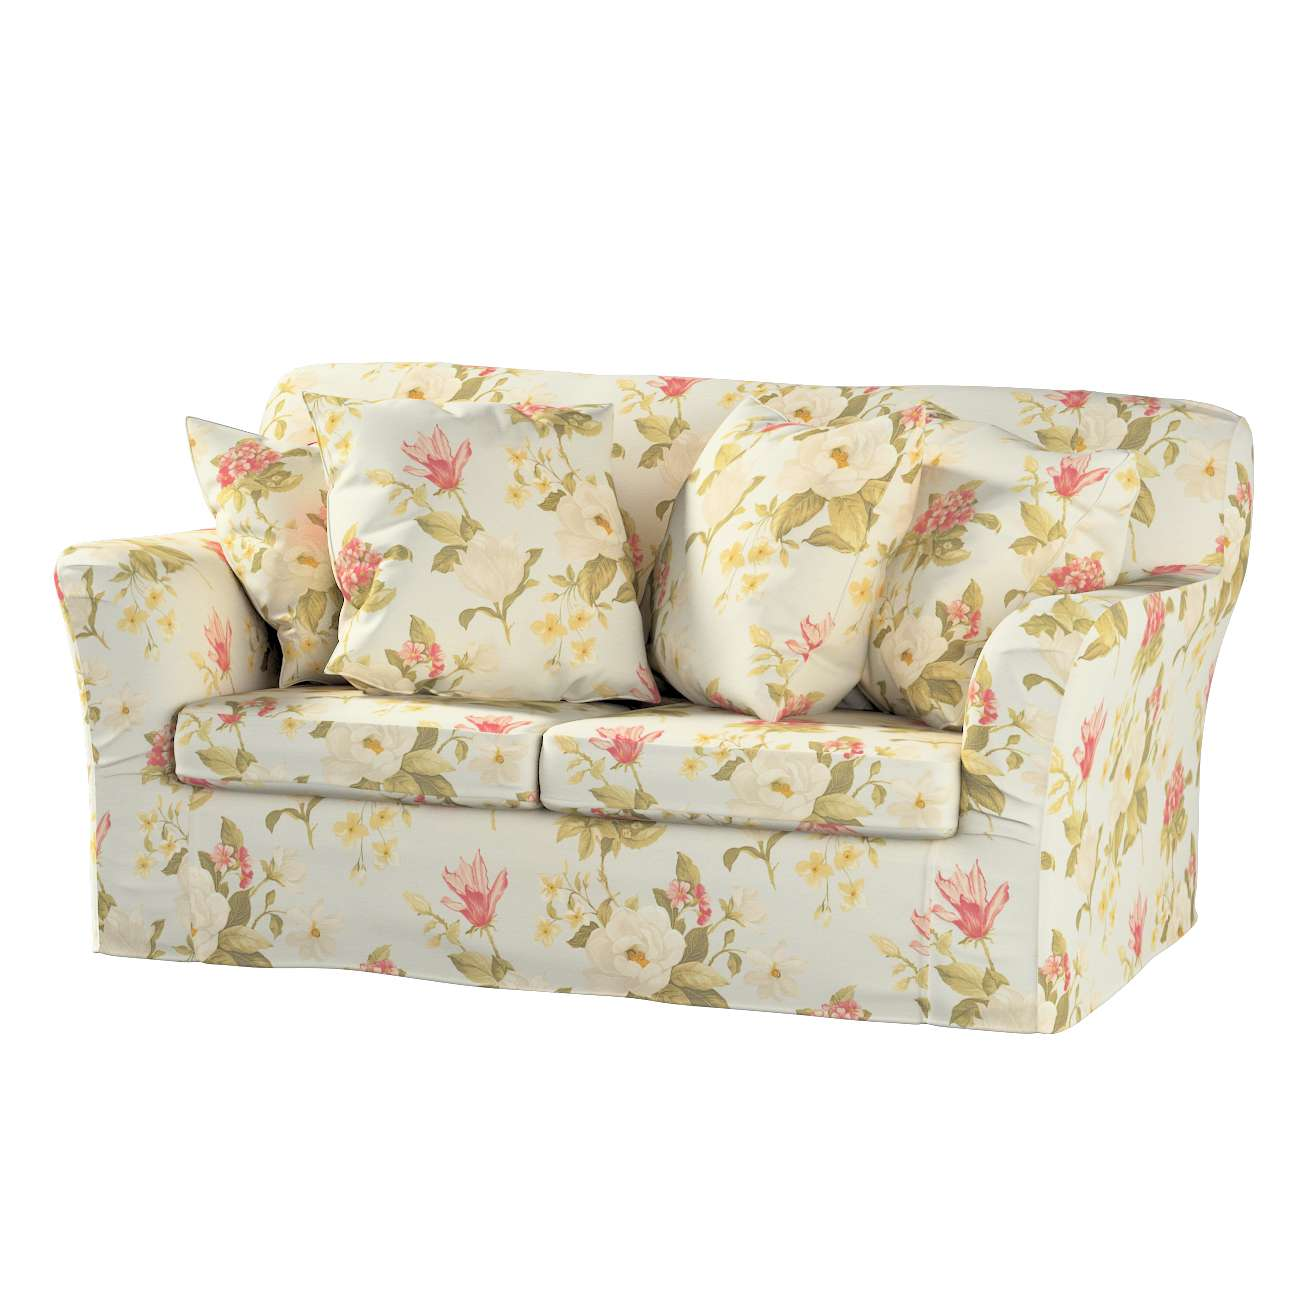 Tomelilla 2-seater sofa cover Tomelilla 2-seat sofa in collection Londres, fabric: 123-65